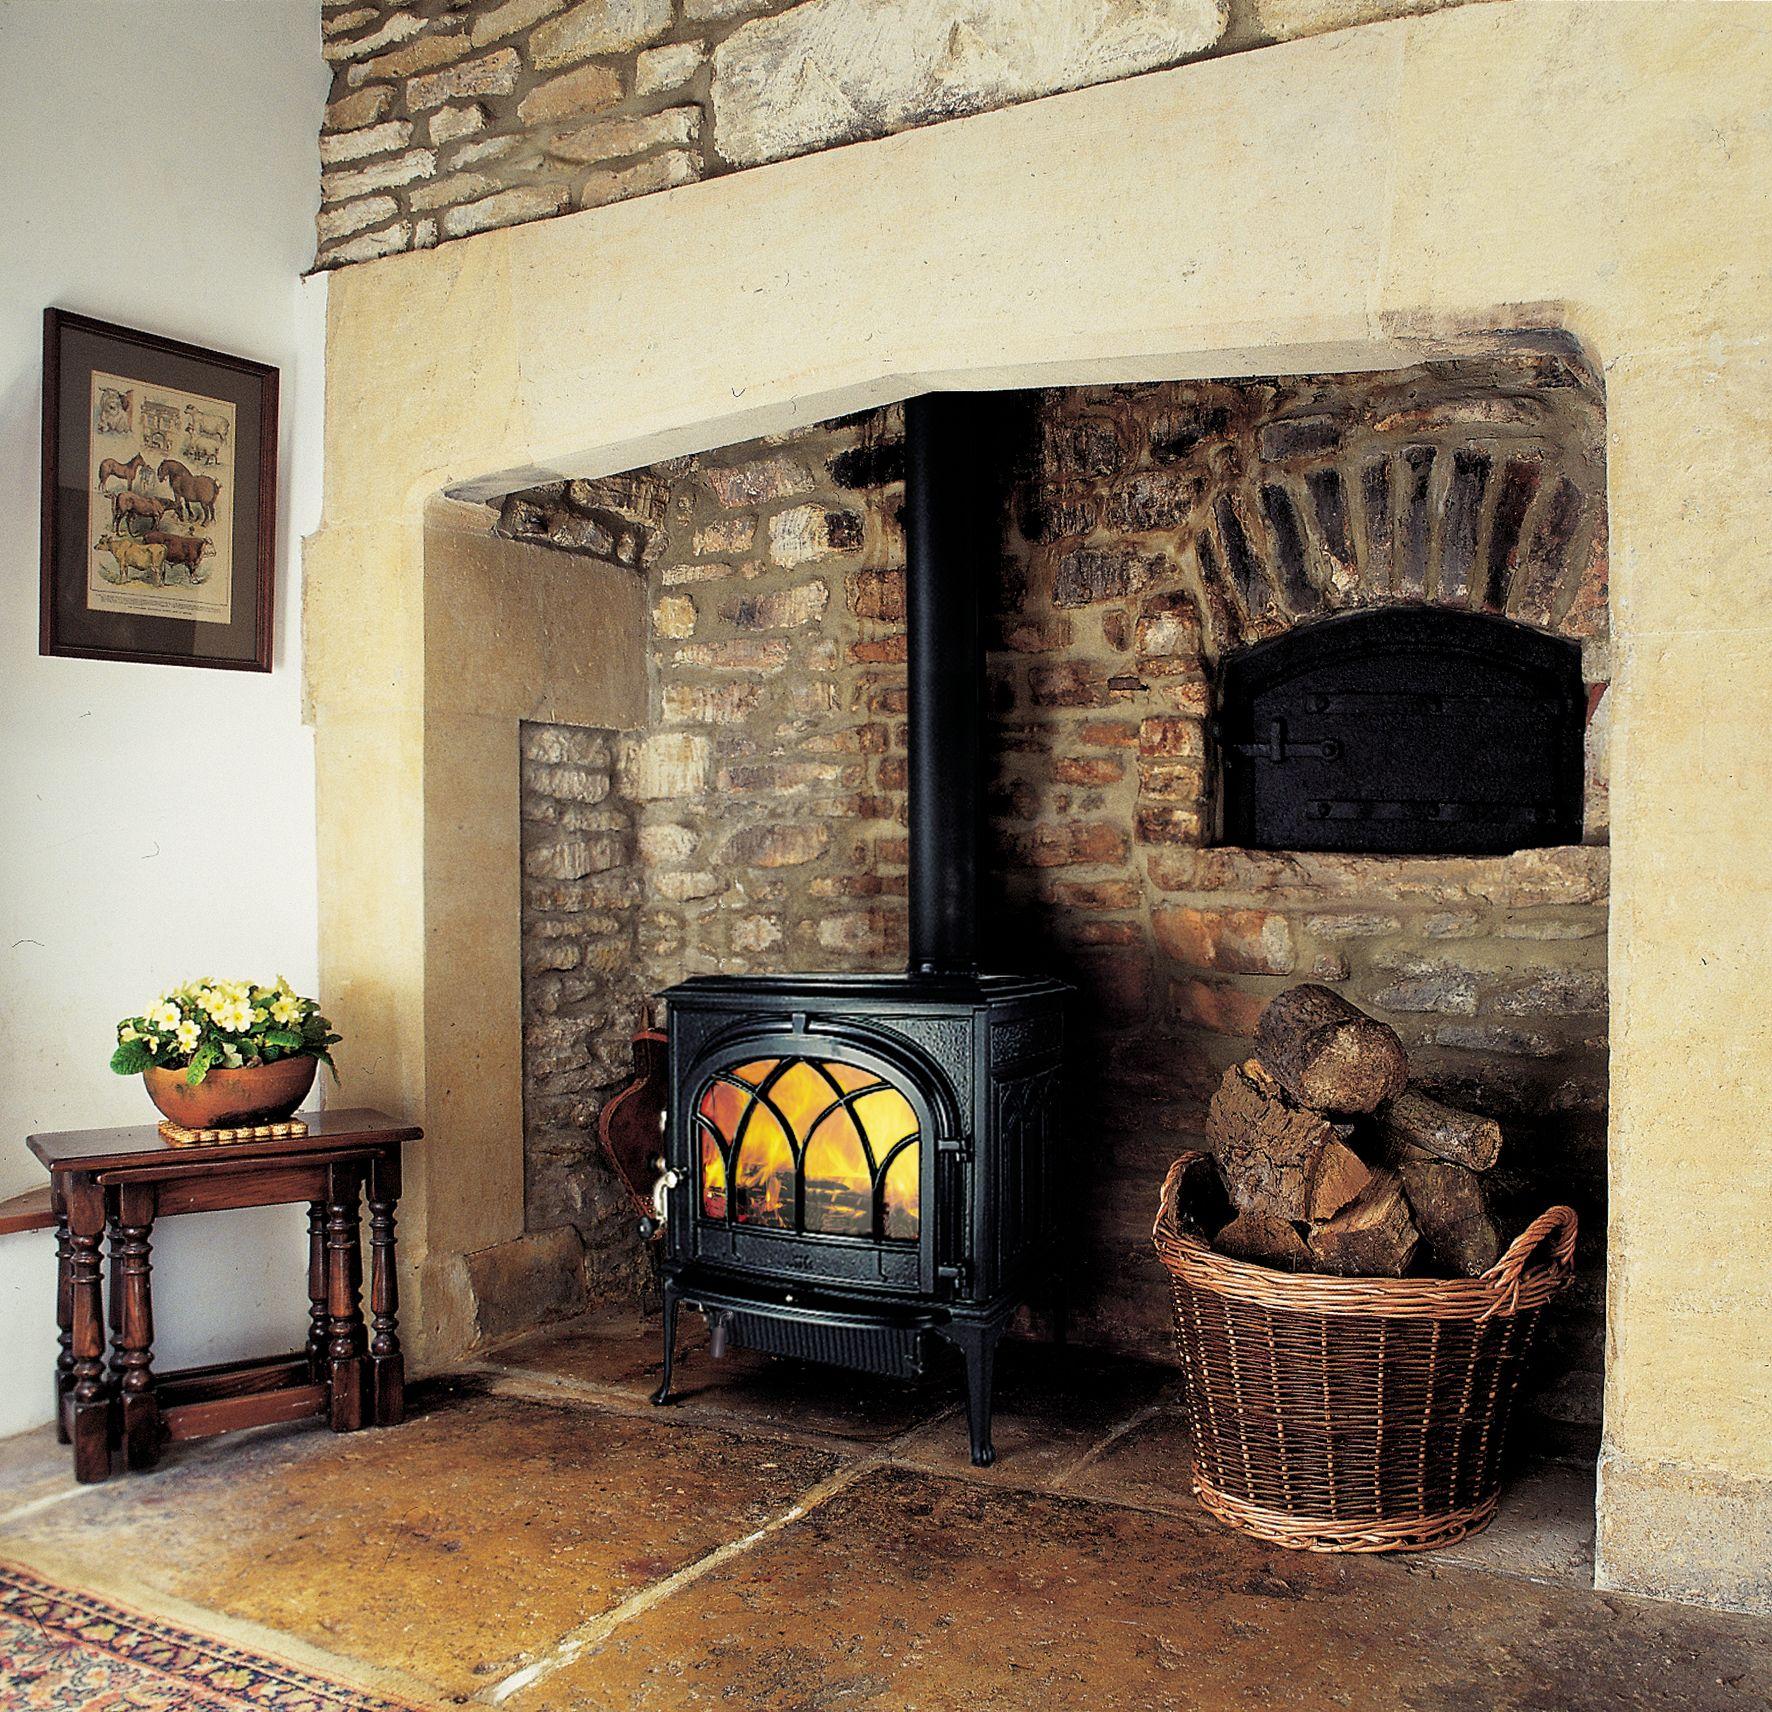 Amundsen Kitchen Hearth Room: Wood Burning Stove Corner, Kitchen Hearth